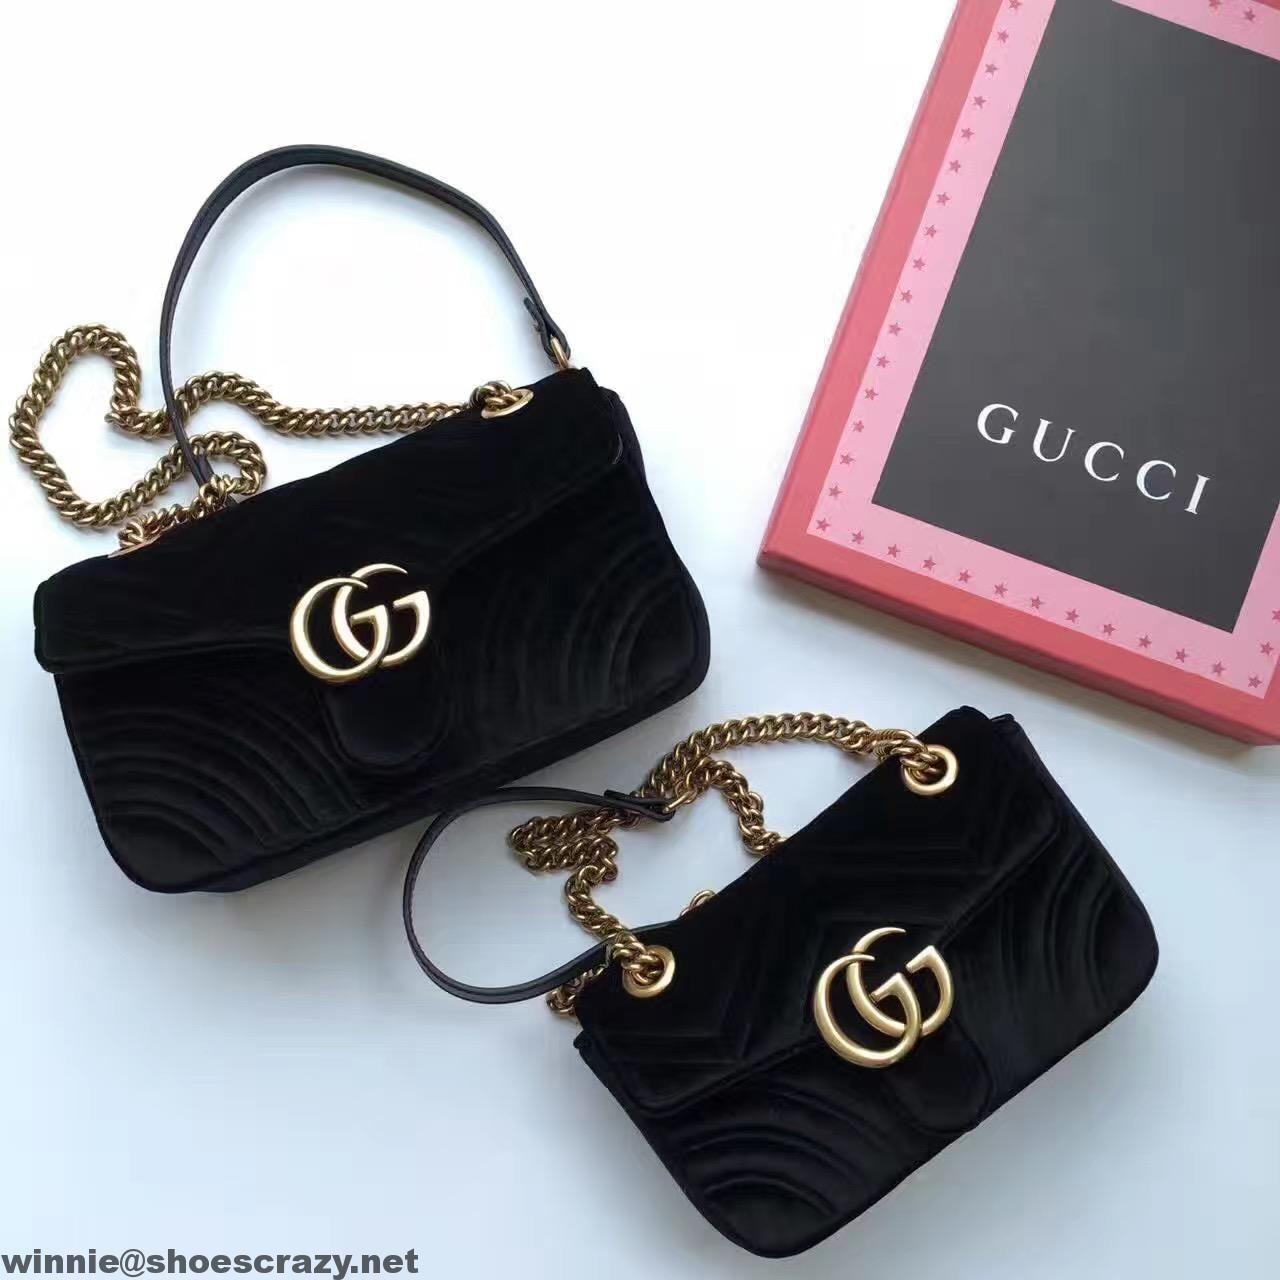 Gucci GG Marmont Velvet Small Shoulder Bag 443497 2016